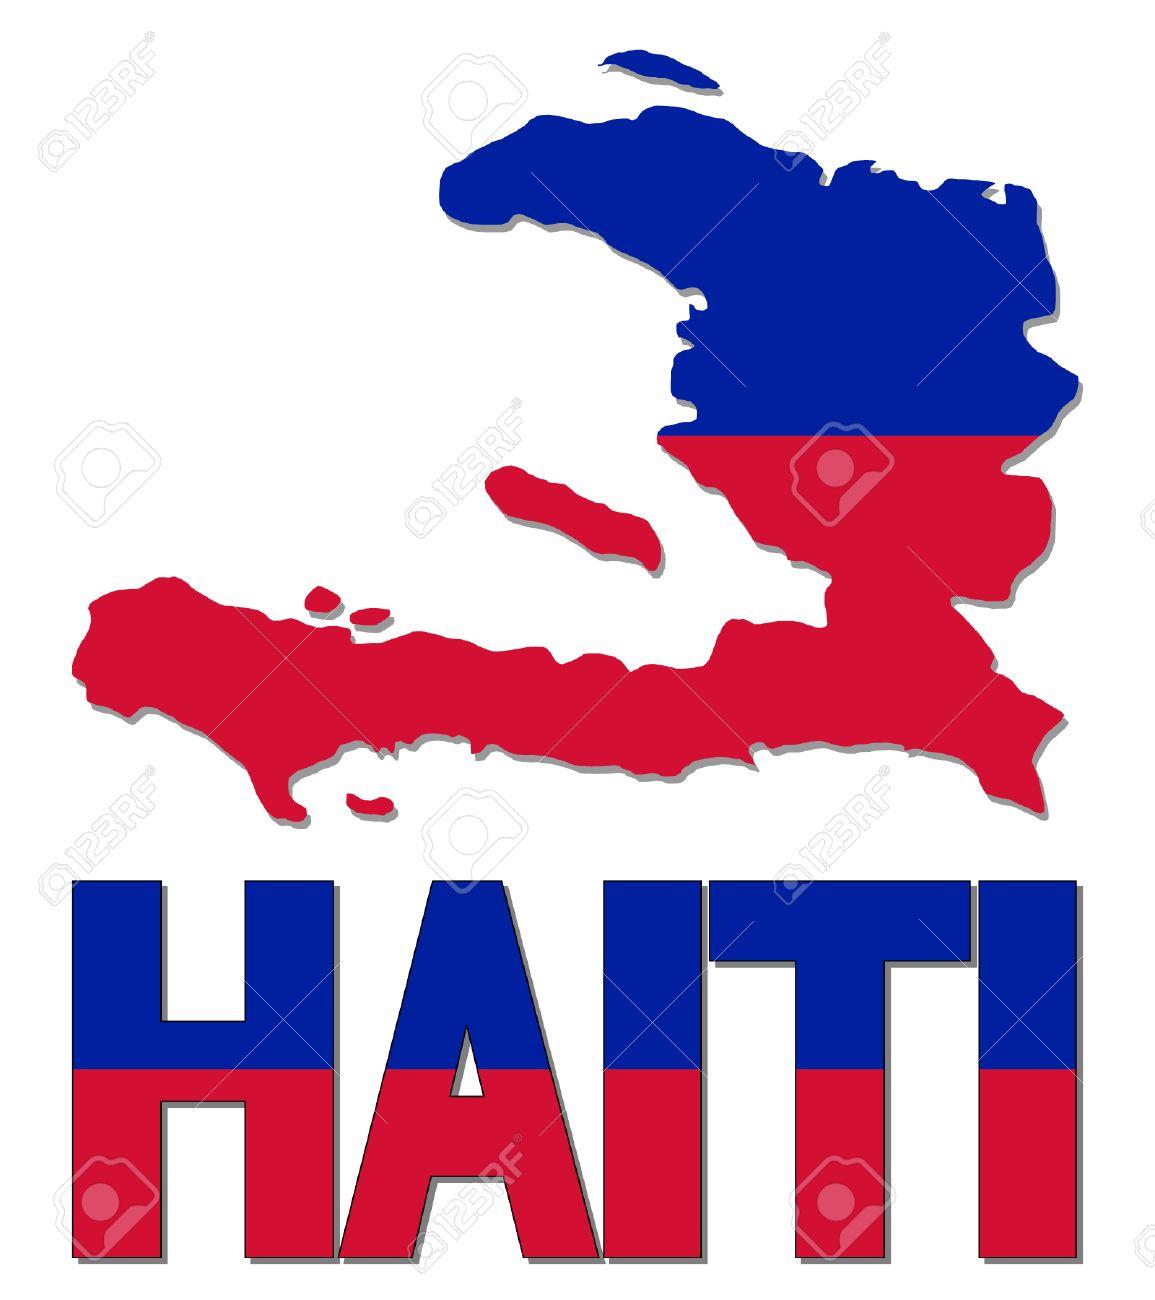 Haiti map flag and text vector illustration.